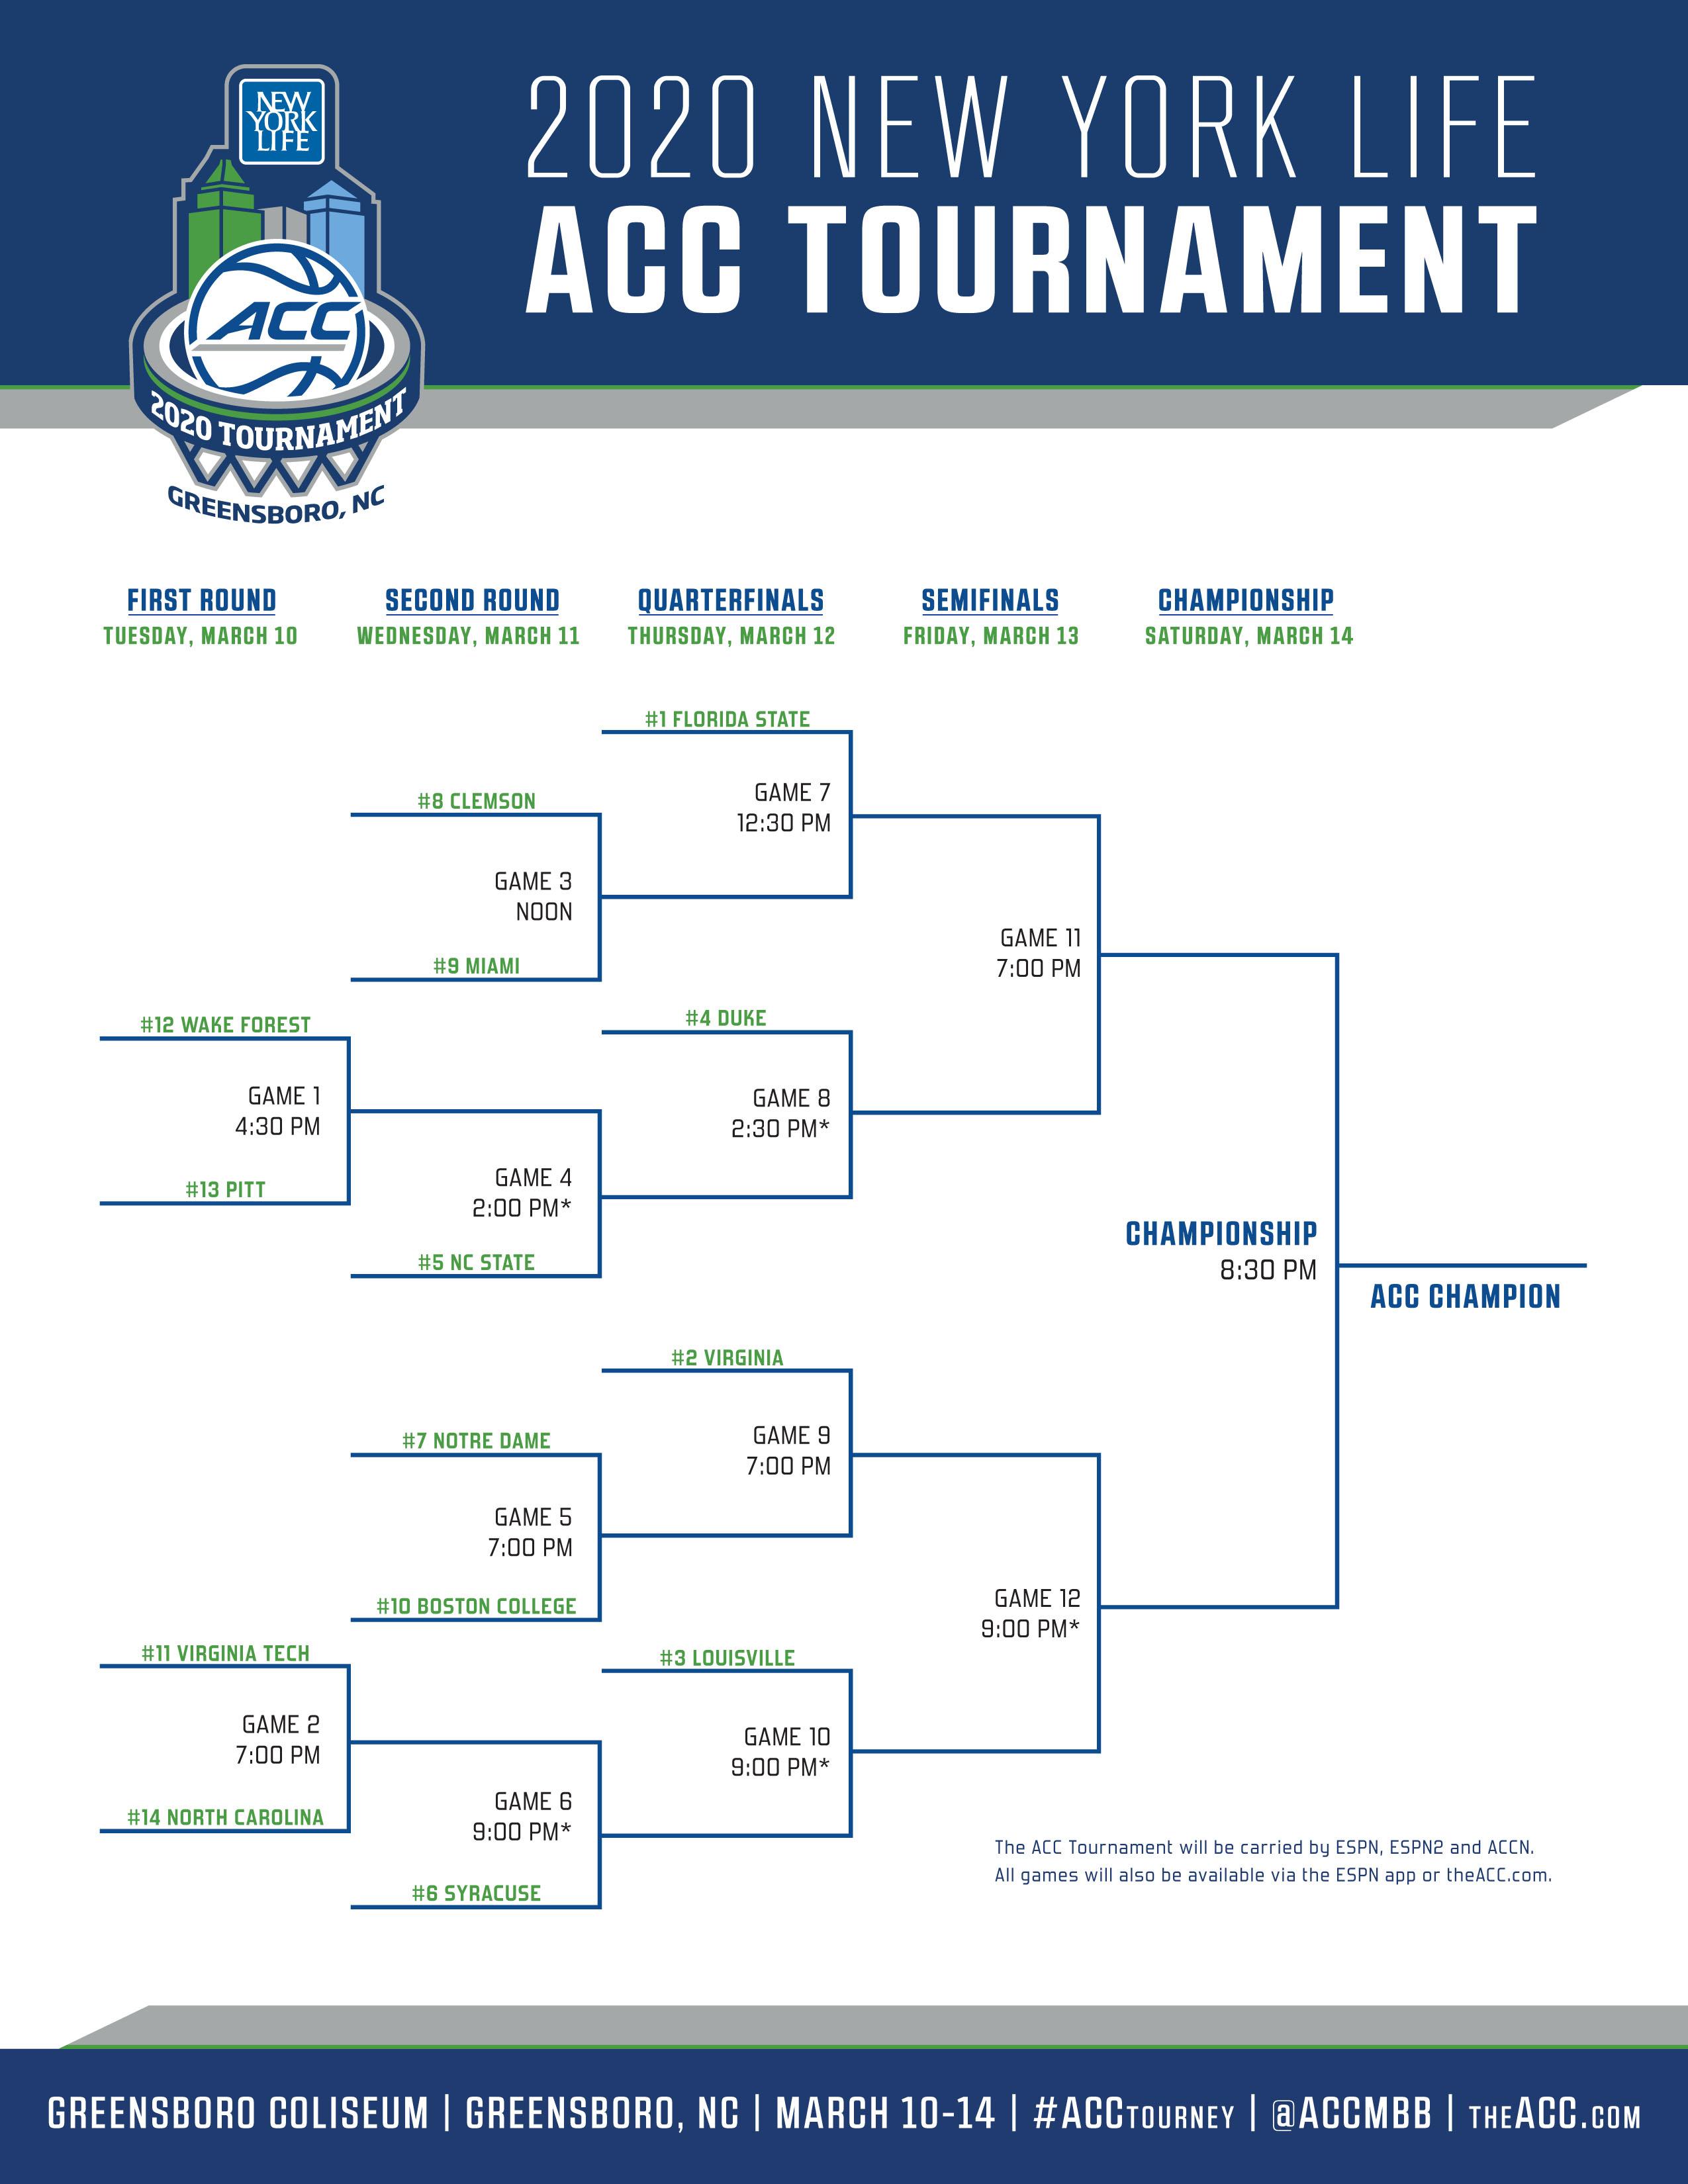 ACC Men's Basketball Tournament set